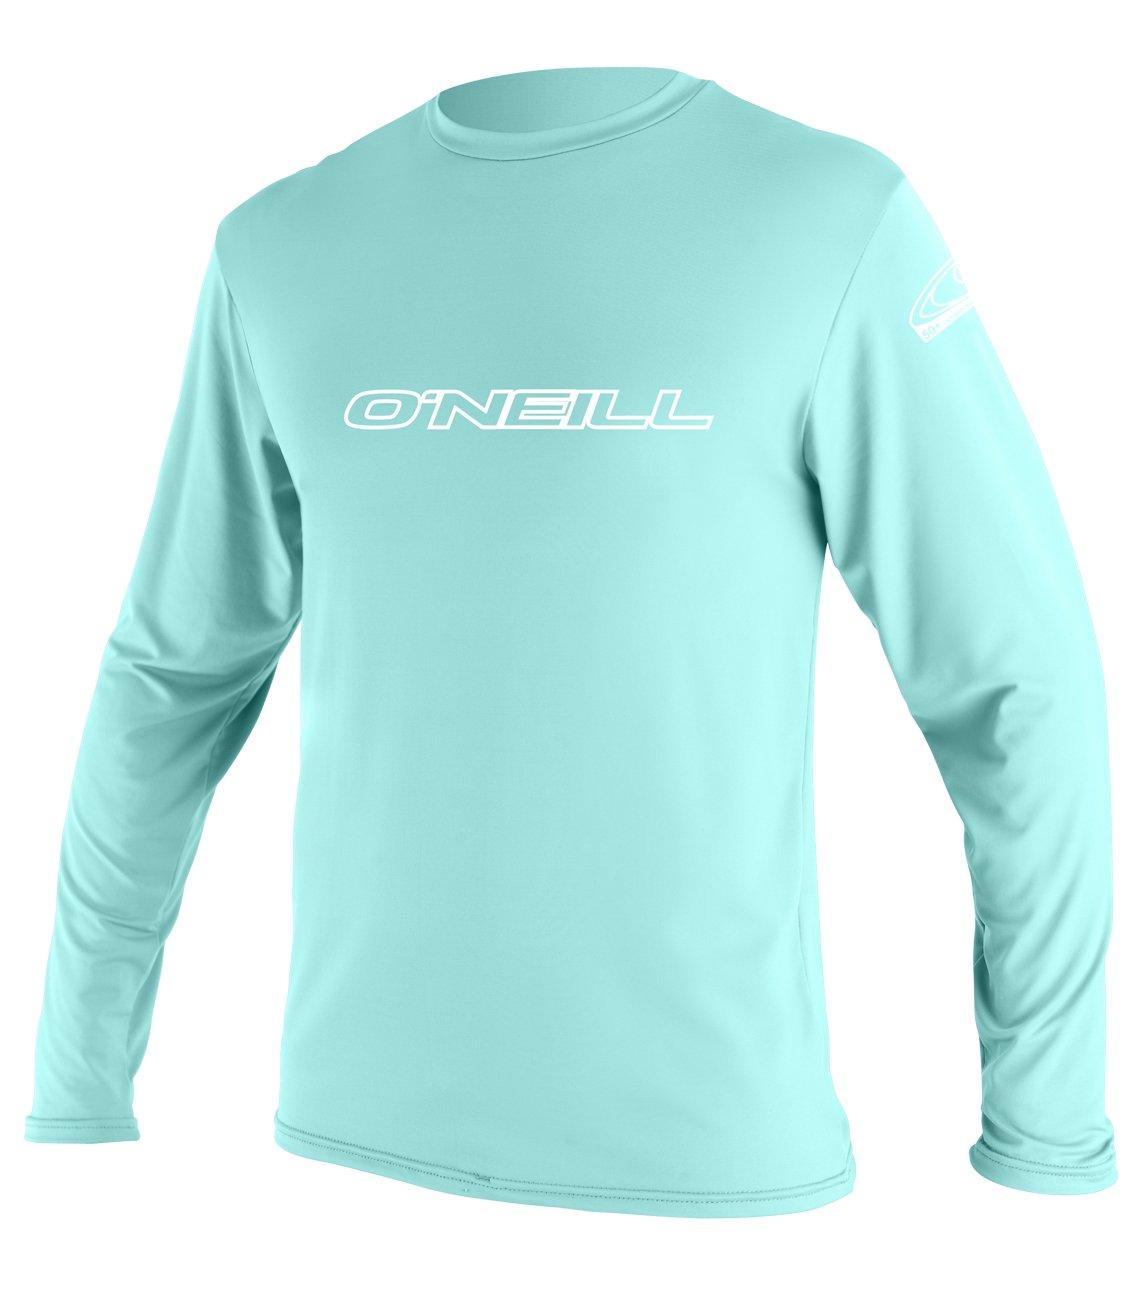 O'Neill Youth Basic Skins UPF 50+ Long Sleeve Sun Shirt, Seaglass, 8 by O'Neill Wetsuits